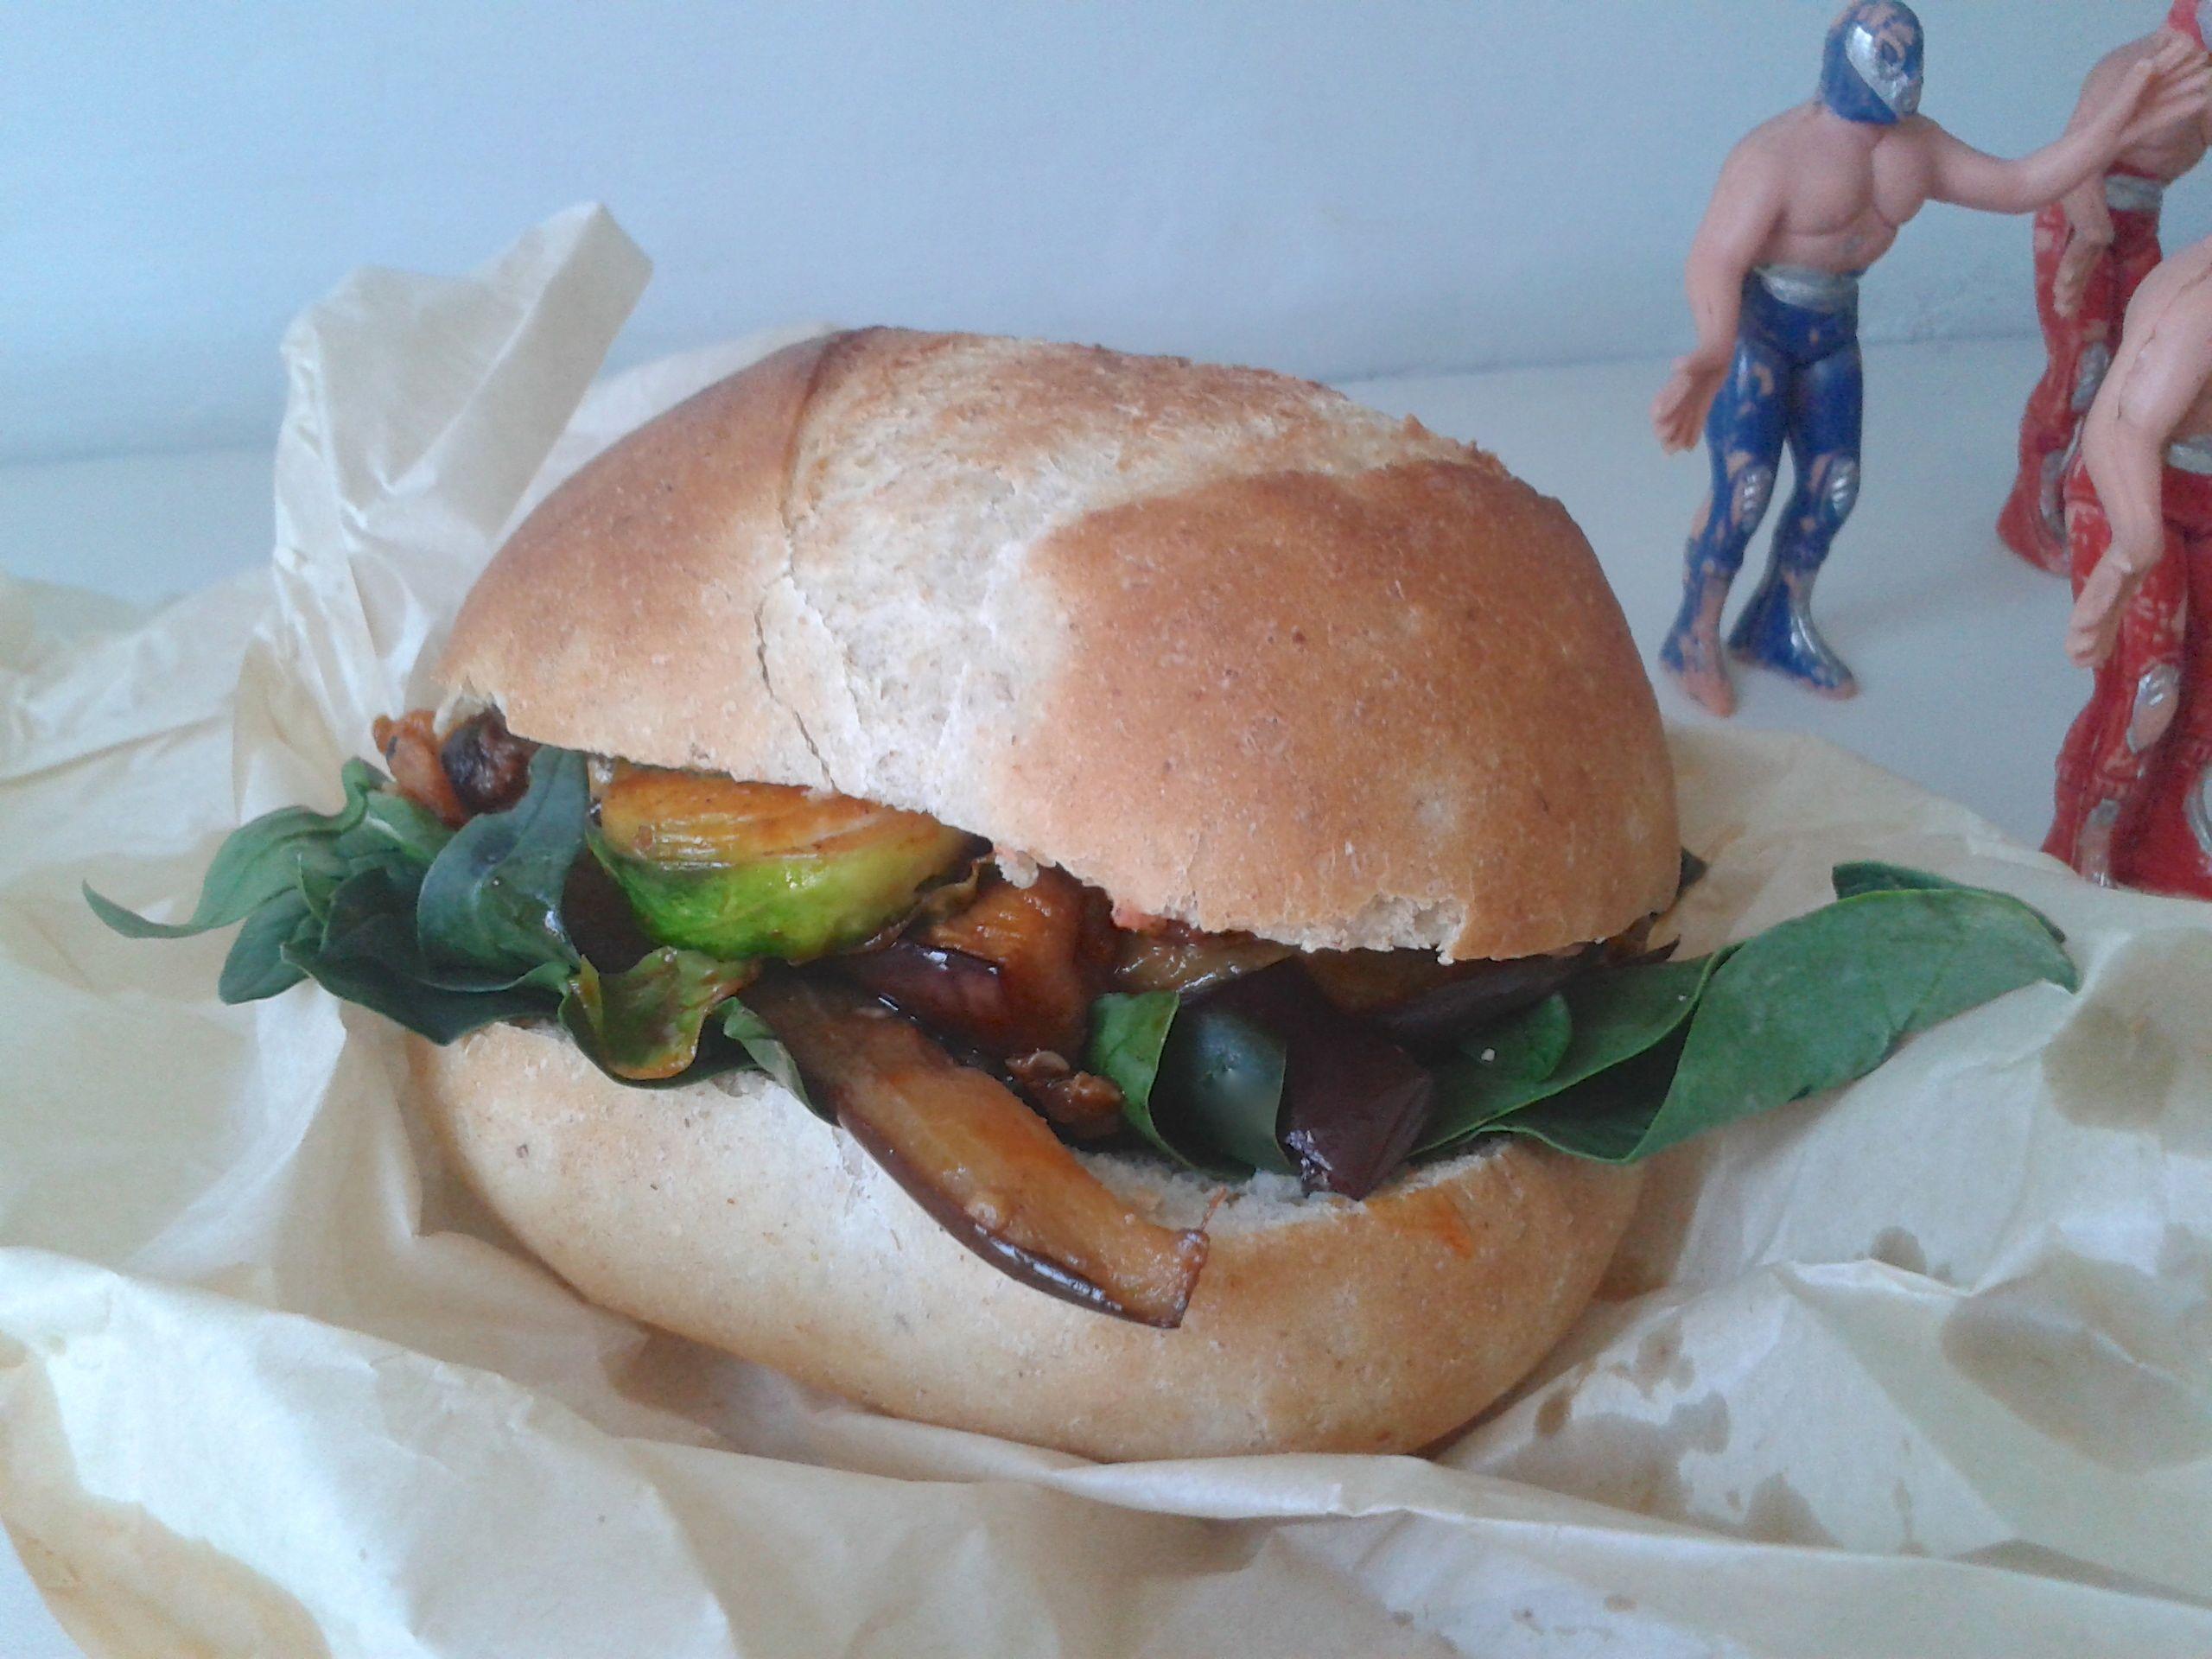 https://i1.wp.com/fatgayvegan.com/wp-content/uploads/2014/02/sprout-sandwich.jpg?fit=2560%2C1920